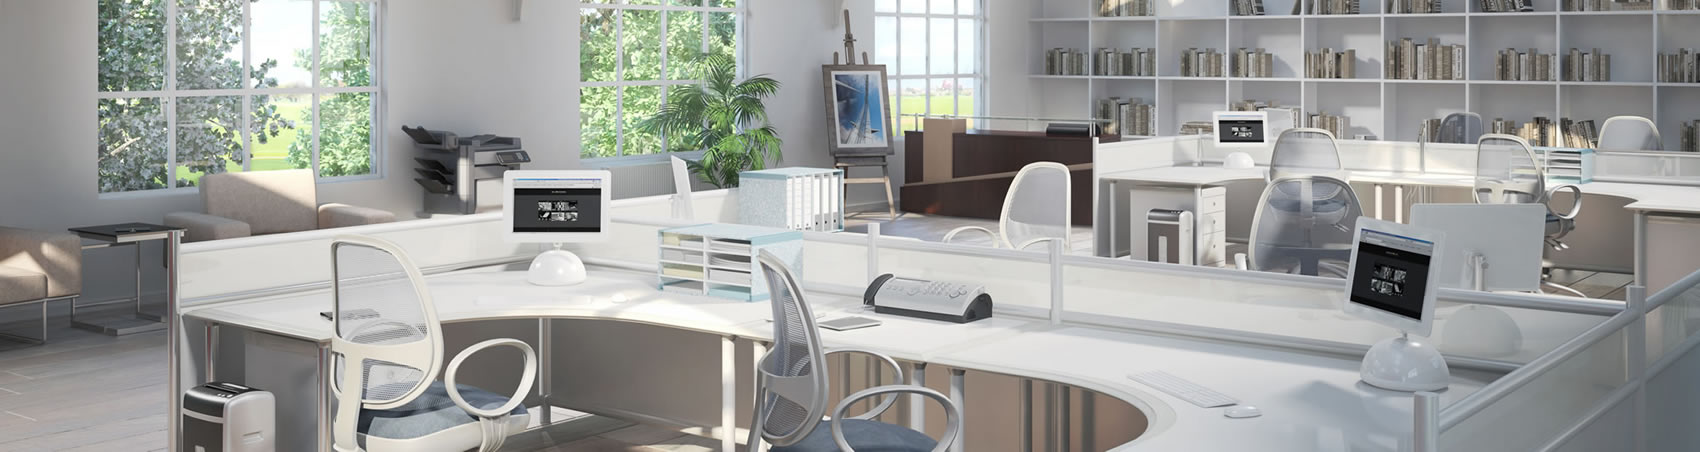 Expert immobilier Avignon bureau